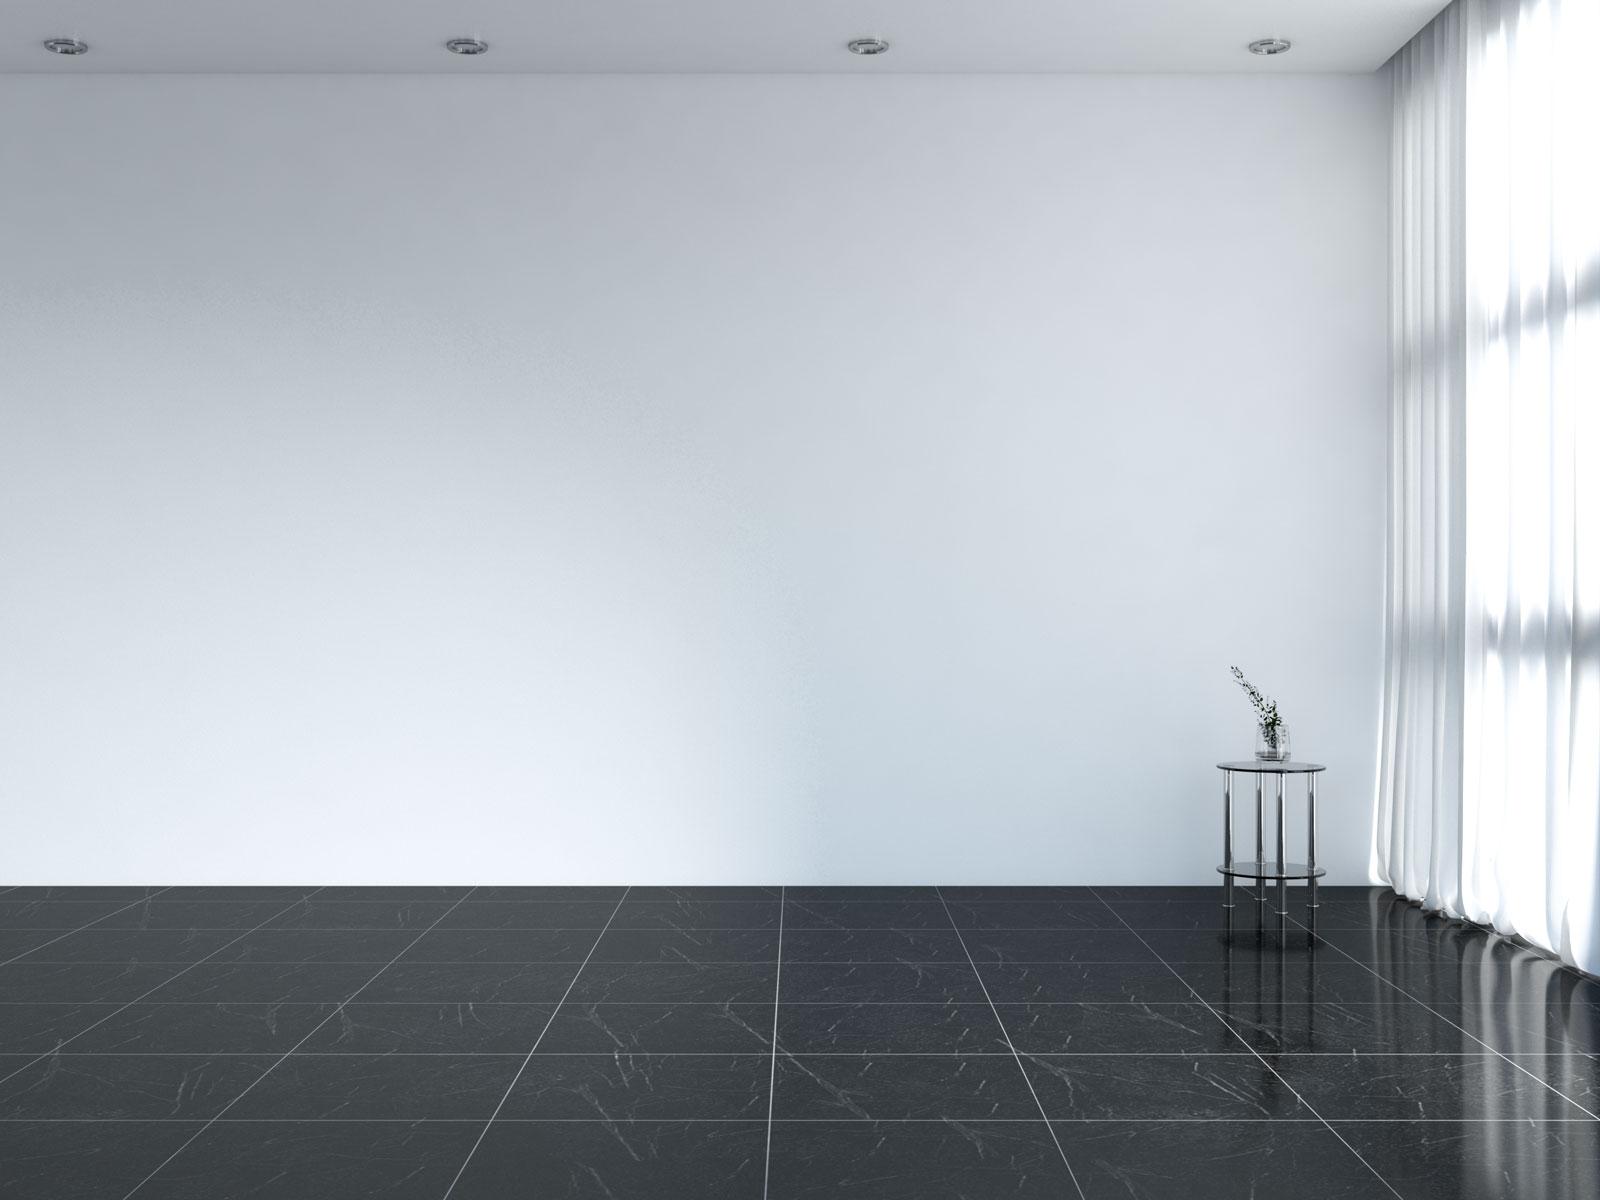 Plain white wall with black floors